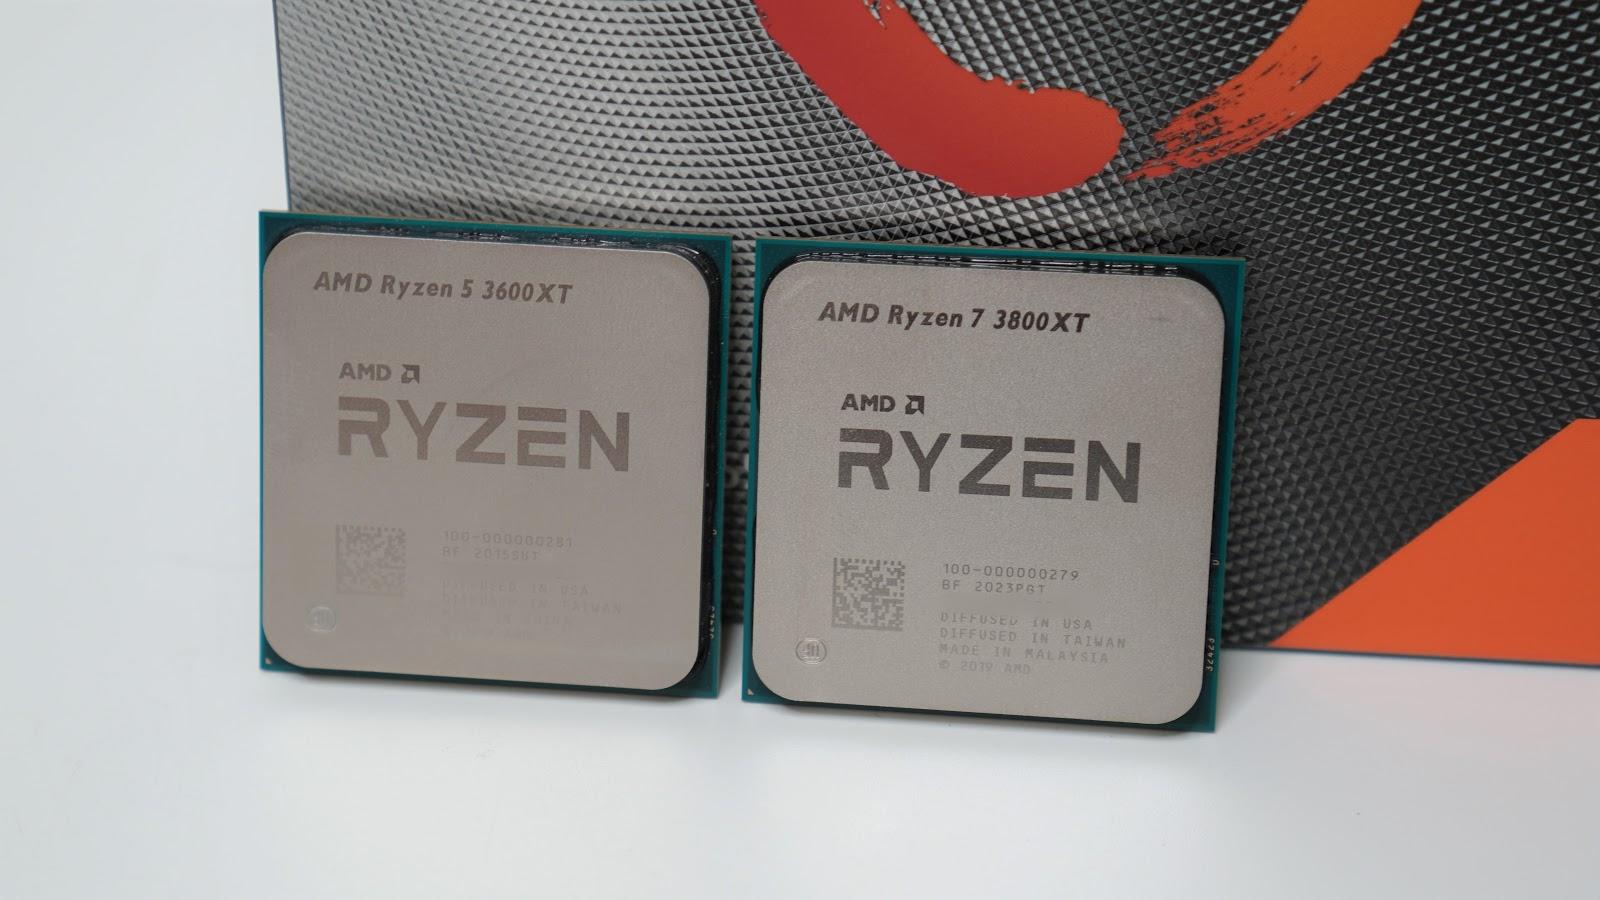 Refined Zen 2 Cpus Are Here Ryzen 7 3800xt Ryzen 5 3600xt Processor Review Uniko S Hardware 電腦電競周邊 輕開箱 評測 新聞